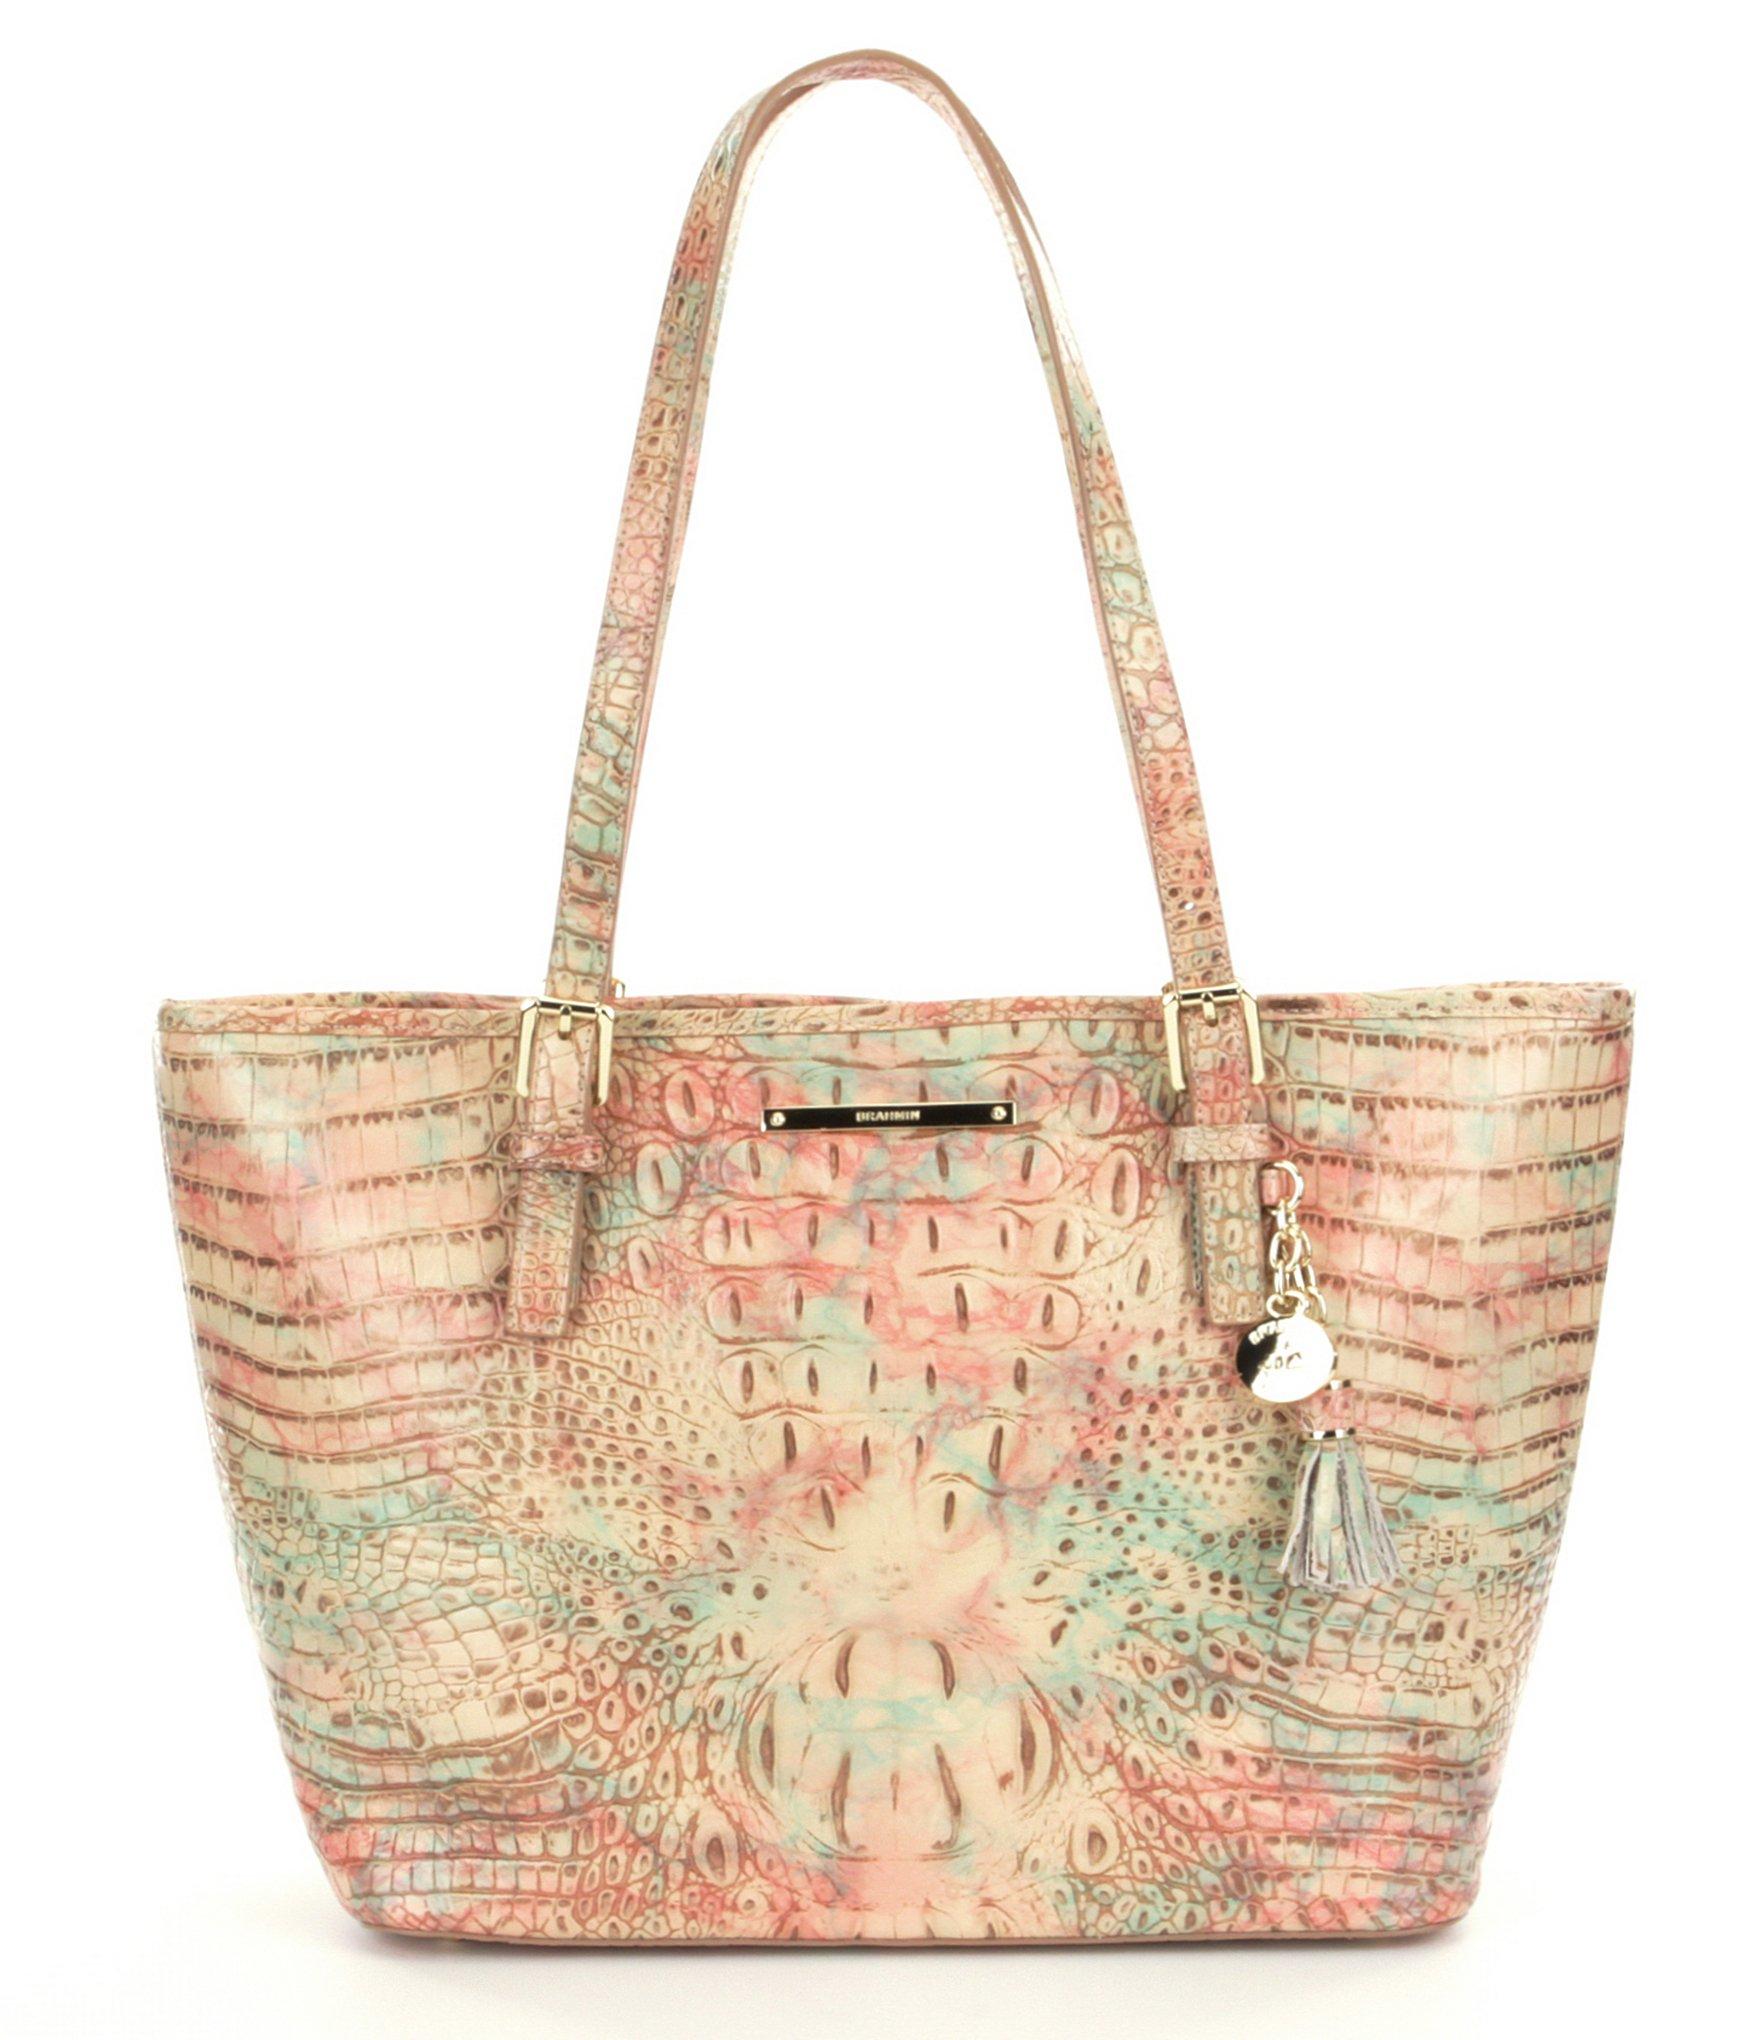 70ad5056ac08 Handbags At Dillards Foto Handbag All Collections Salonagafiya